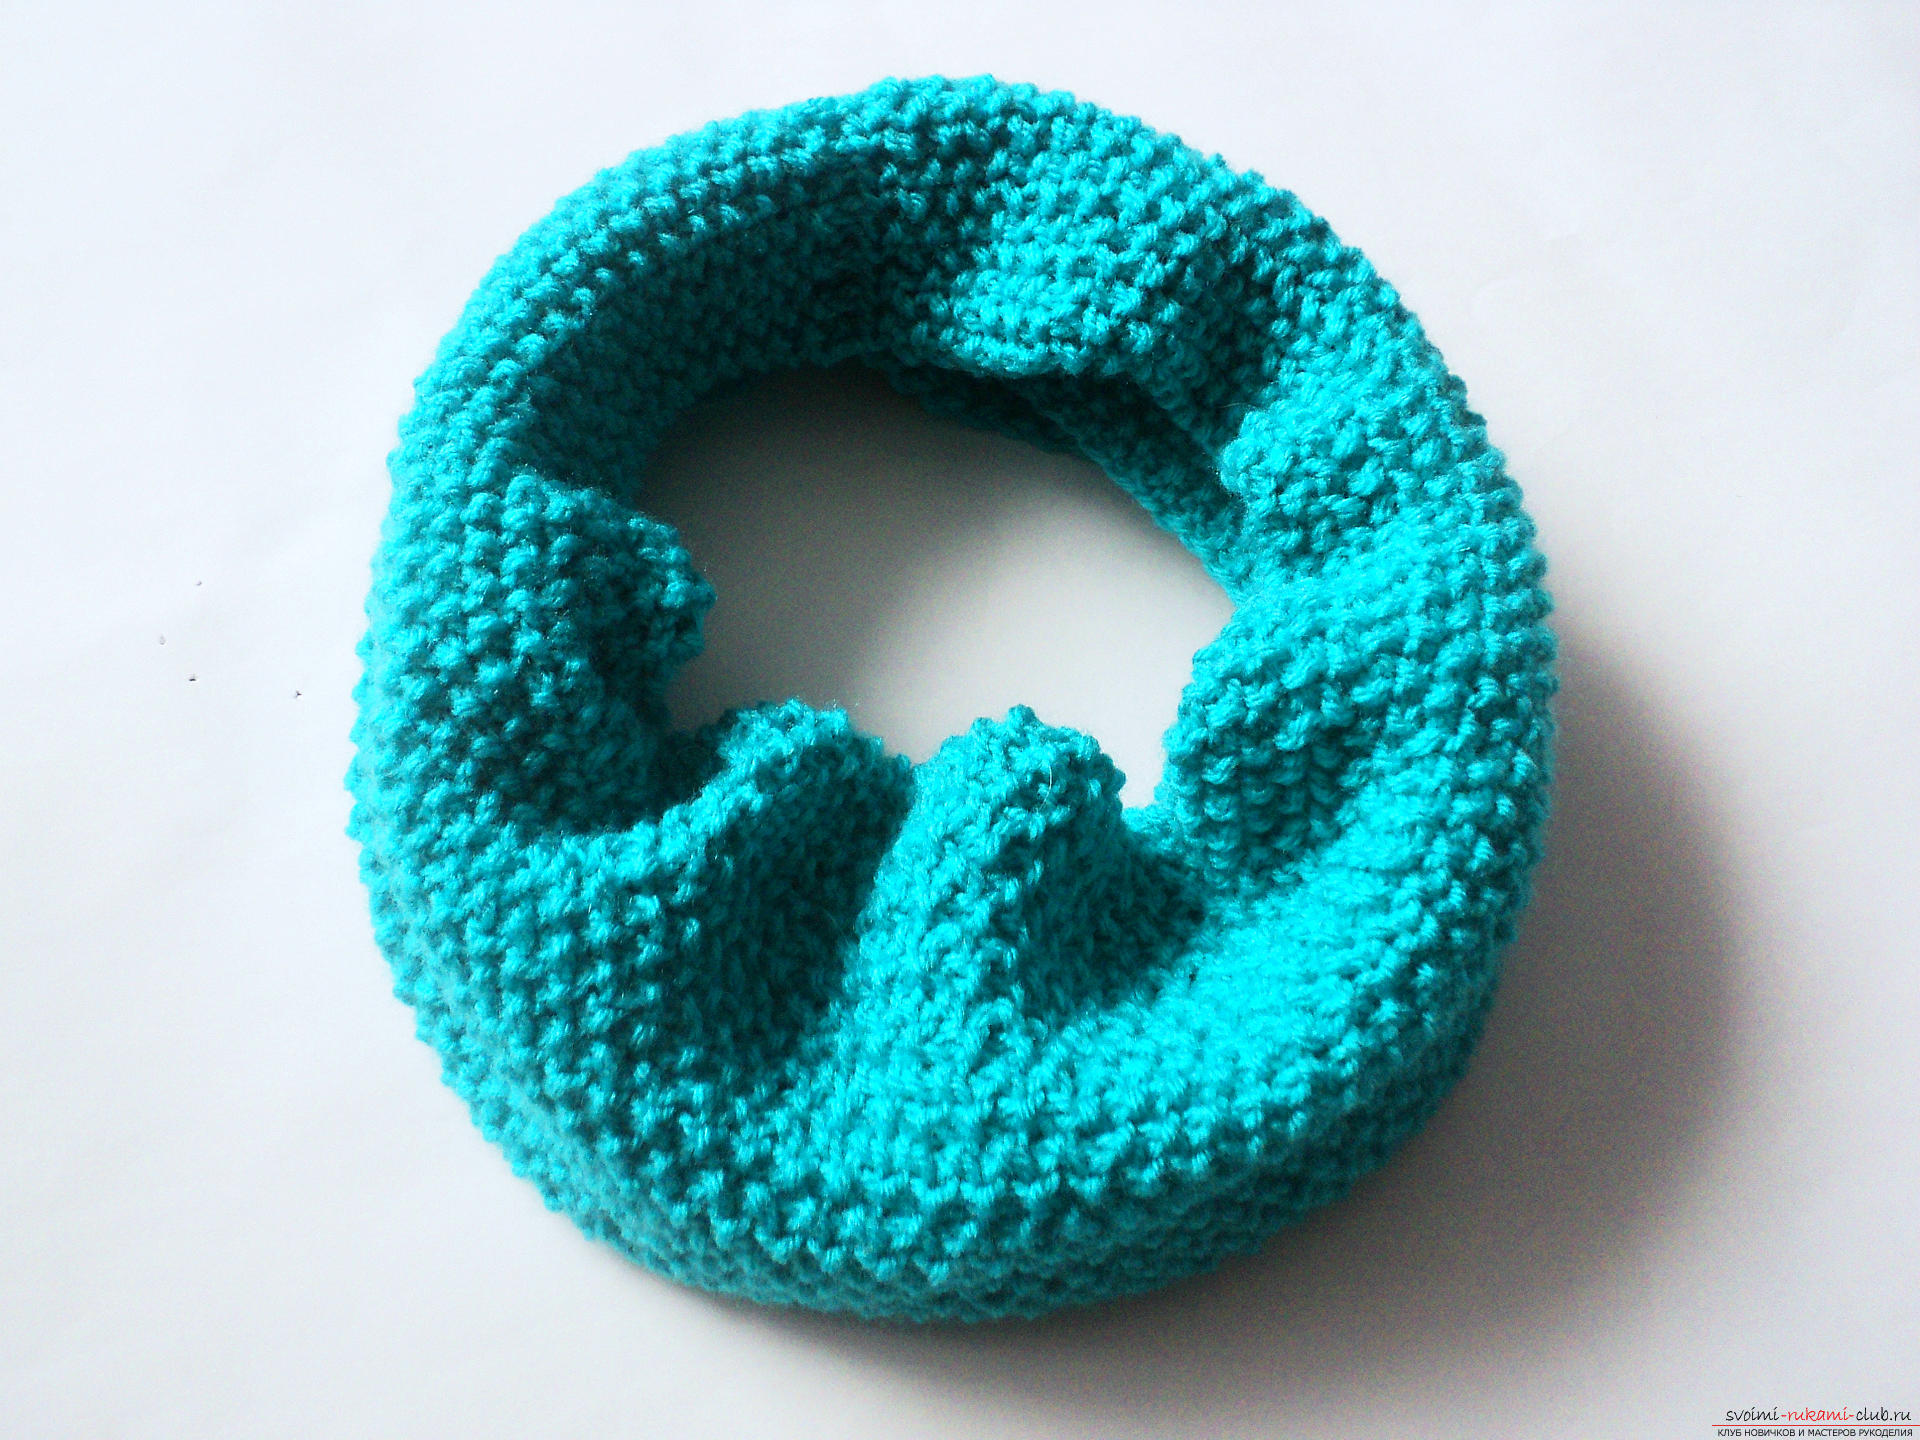 Ажурный узор шарфа спицами схема